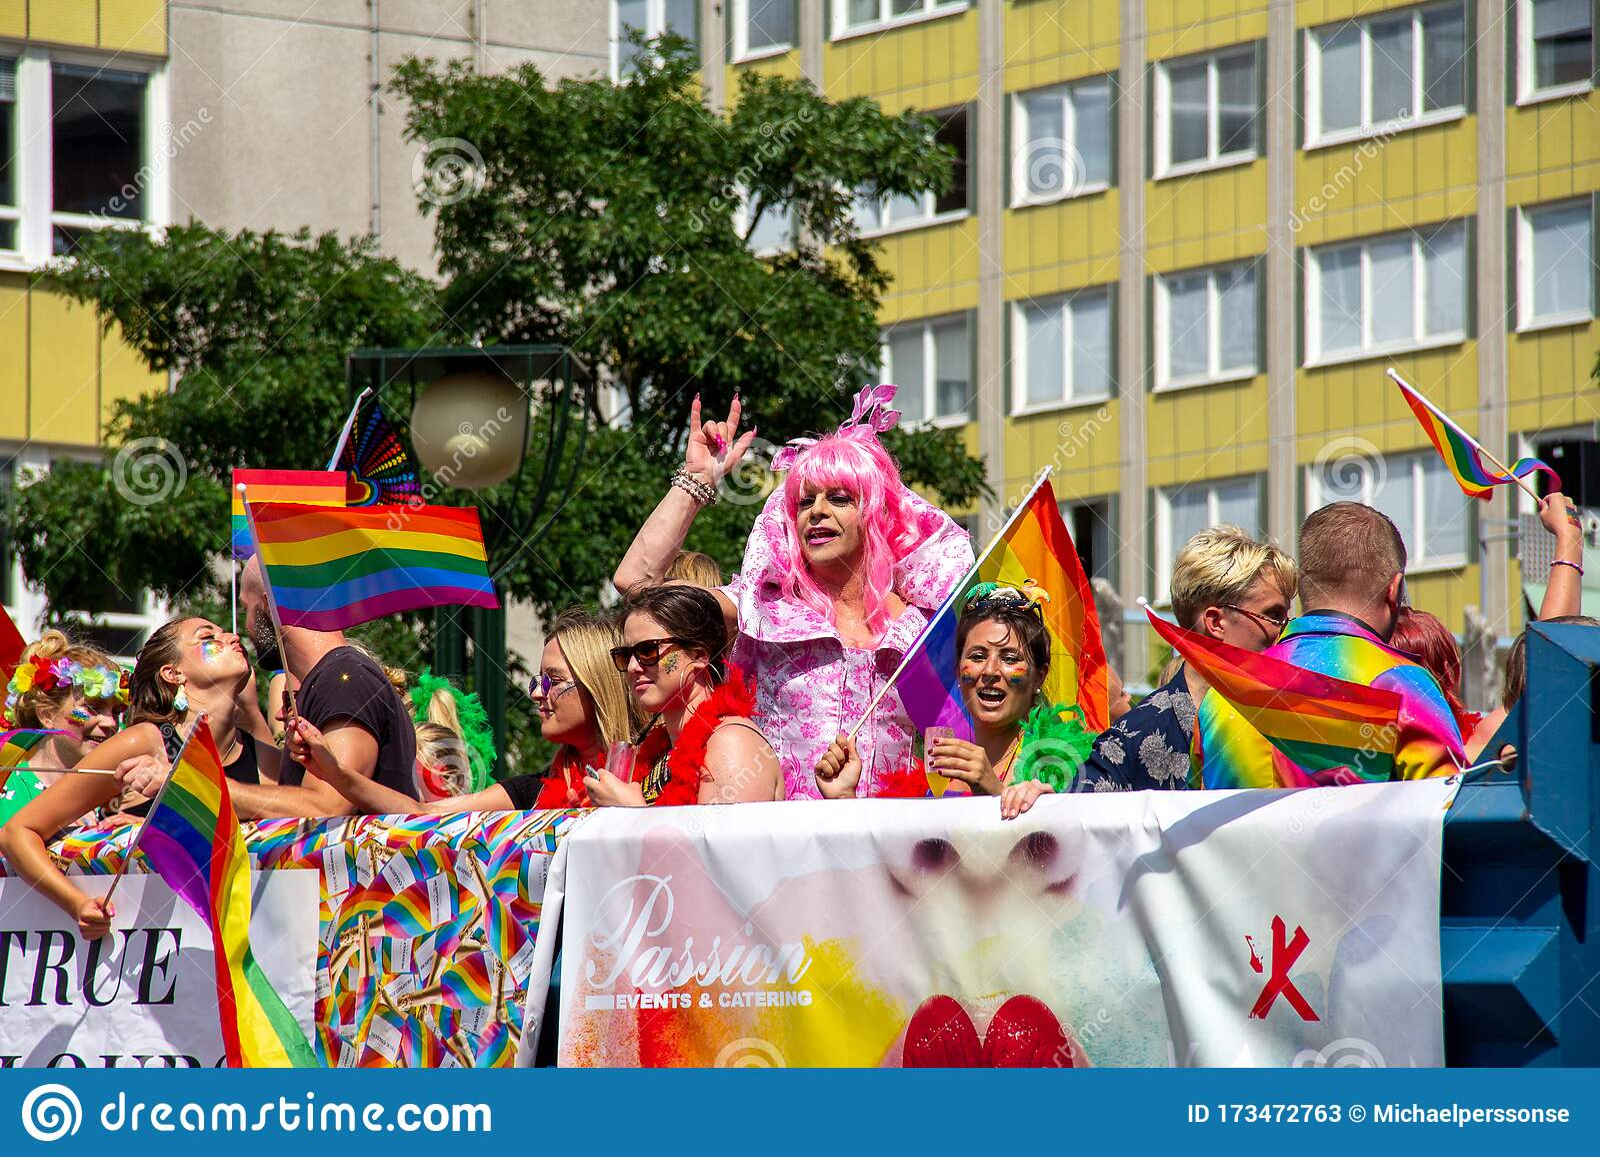 San Francisco Pride Parade Colorful Trolley Float